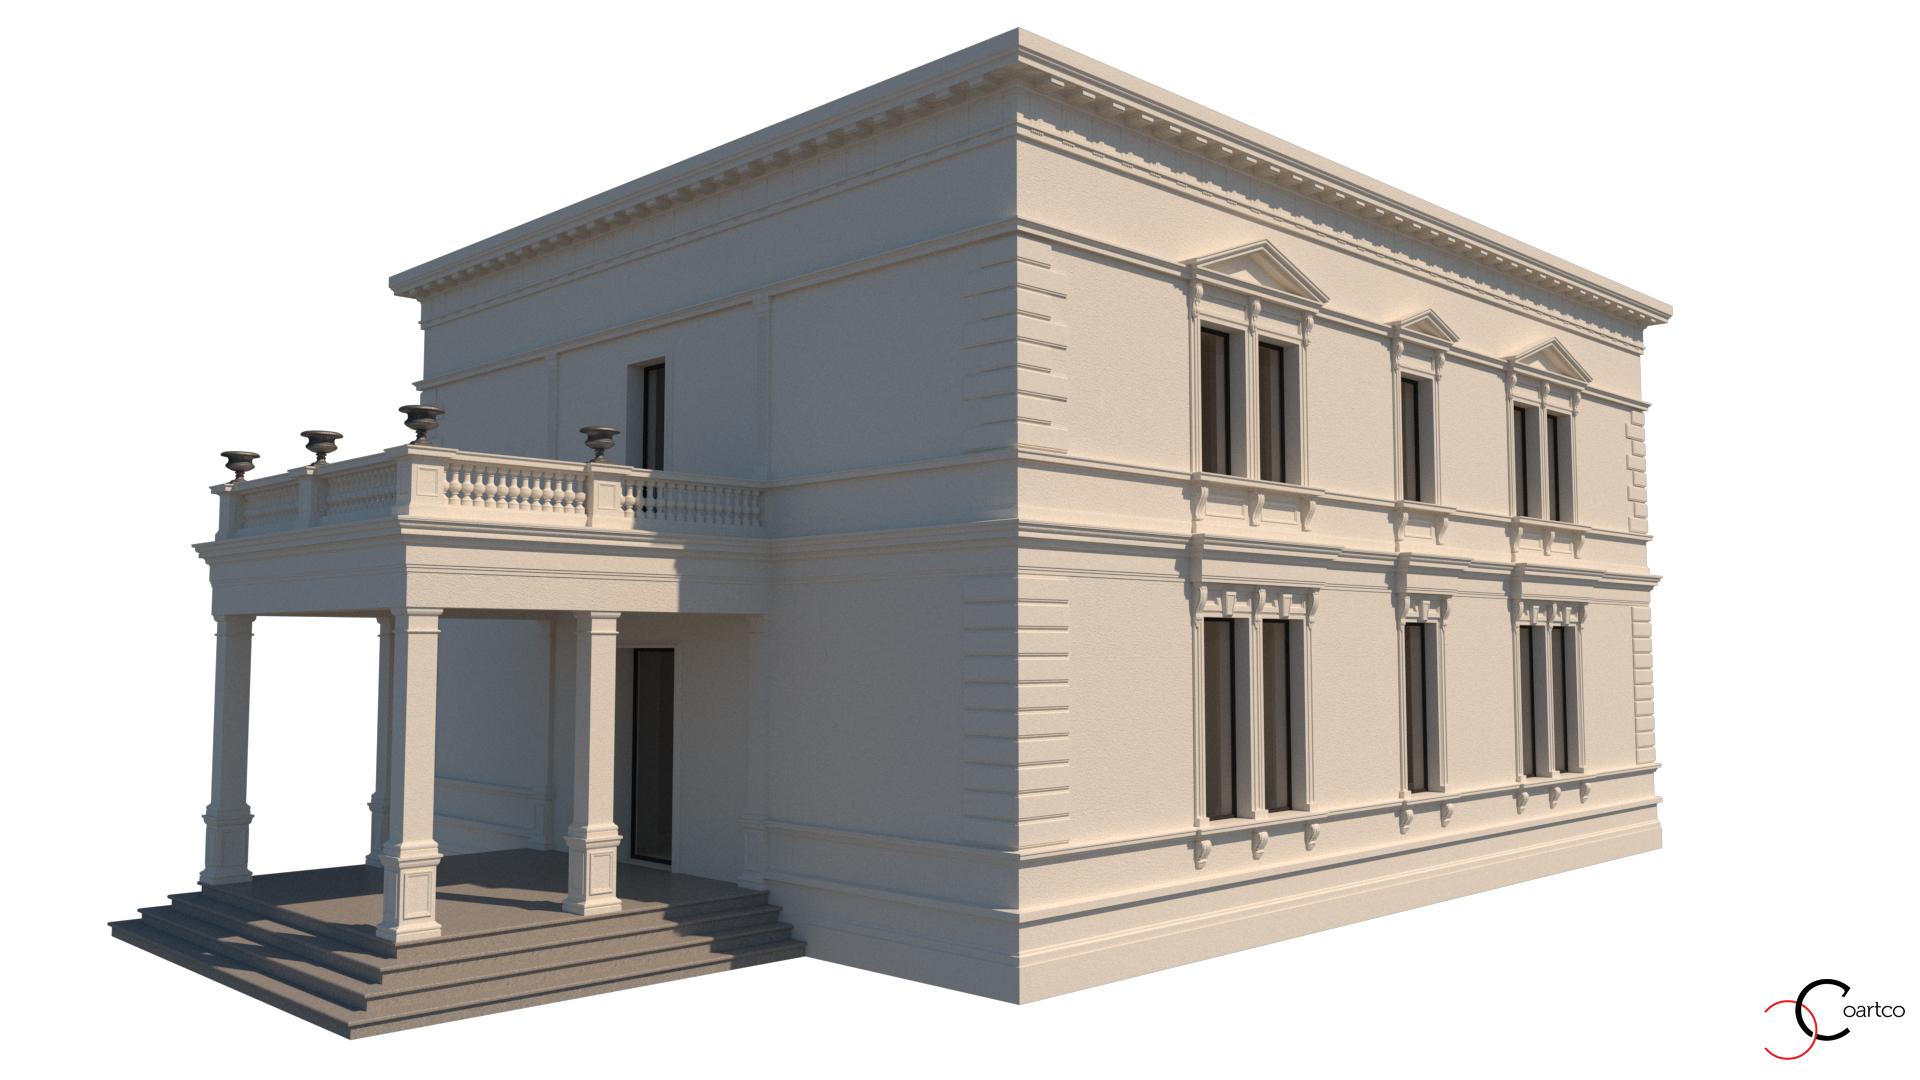 proiect-casa-etaj-cu-elemente-arhitecturale